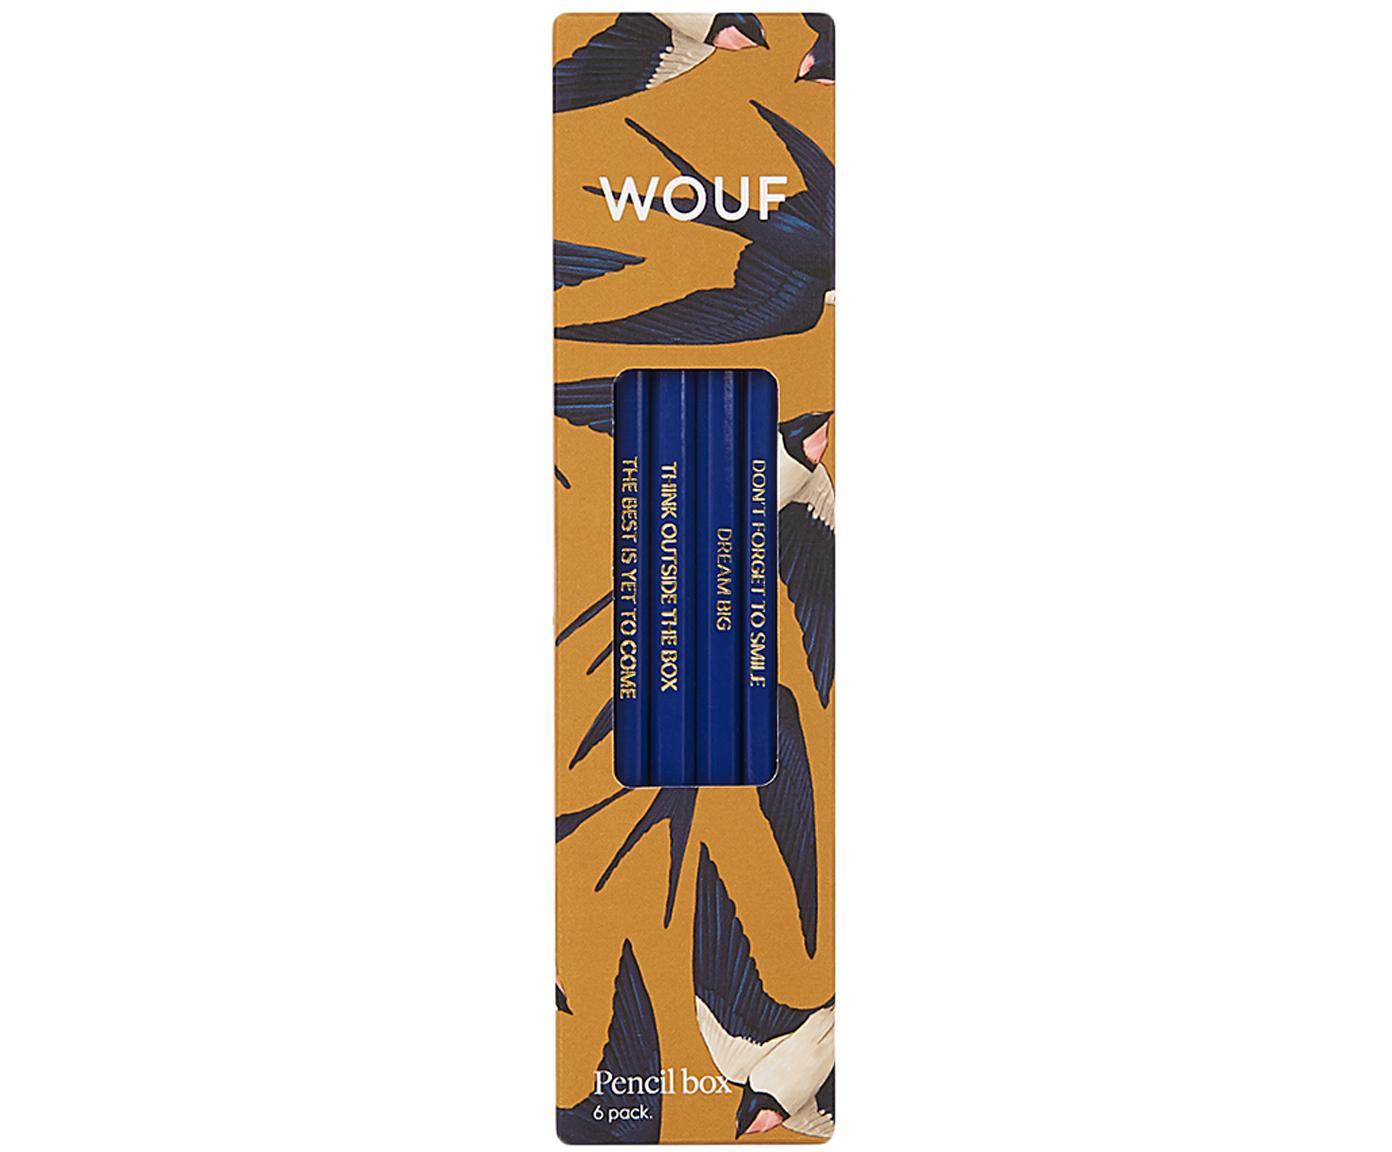 Set matite Swallow, 6 pz., Legno, Giallo, blu, beige, Larg. 18 x Alt. 5 cm